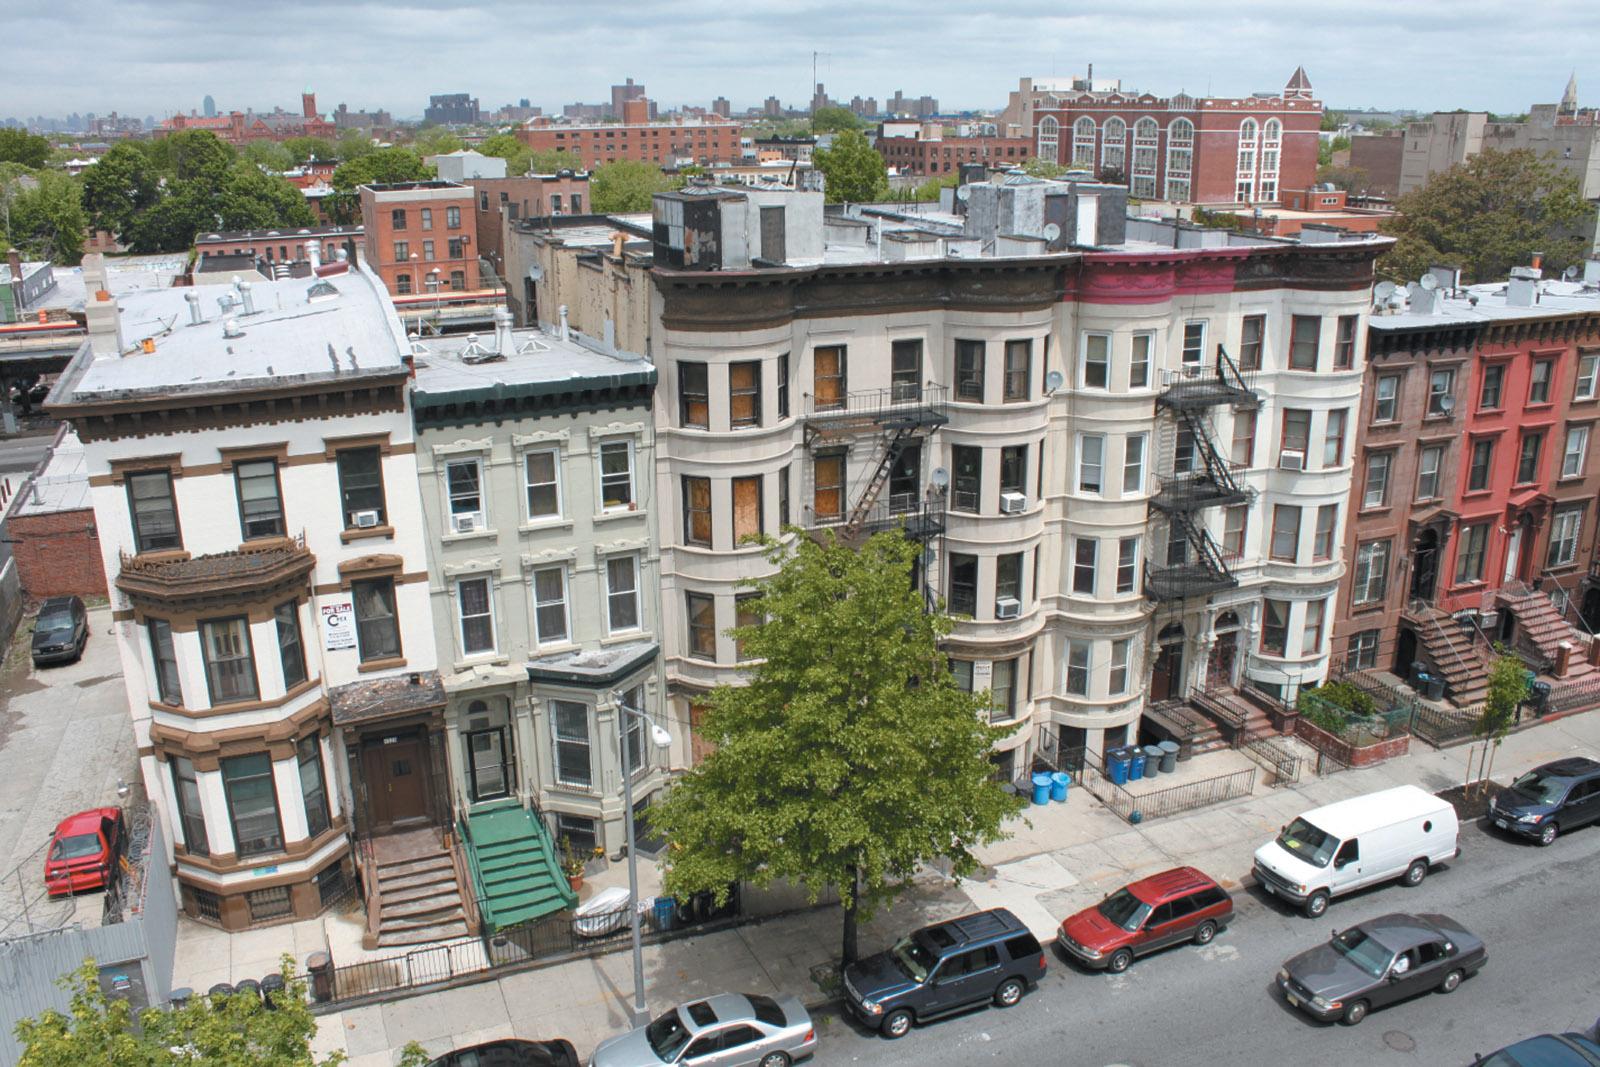 Tenants under siege inside new york city s housing crisis for Stuyvesant ny